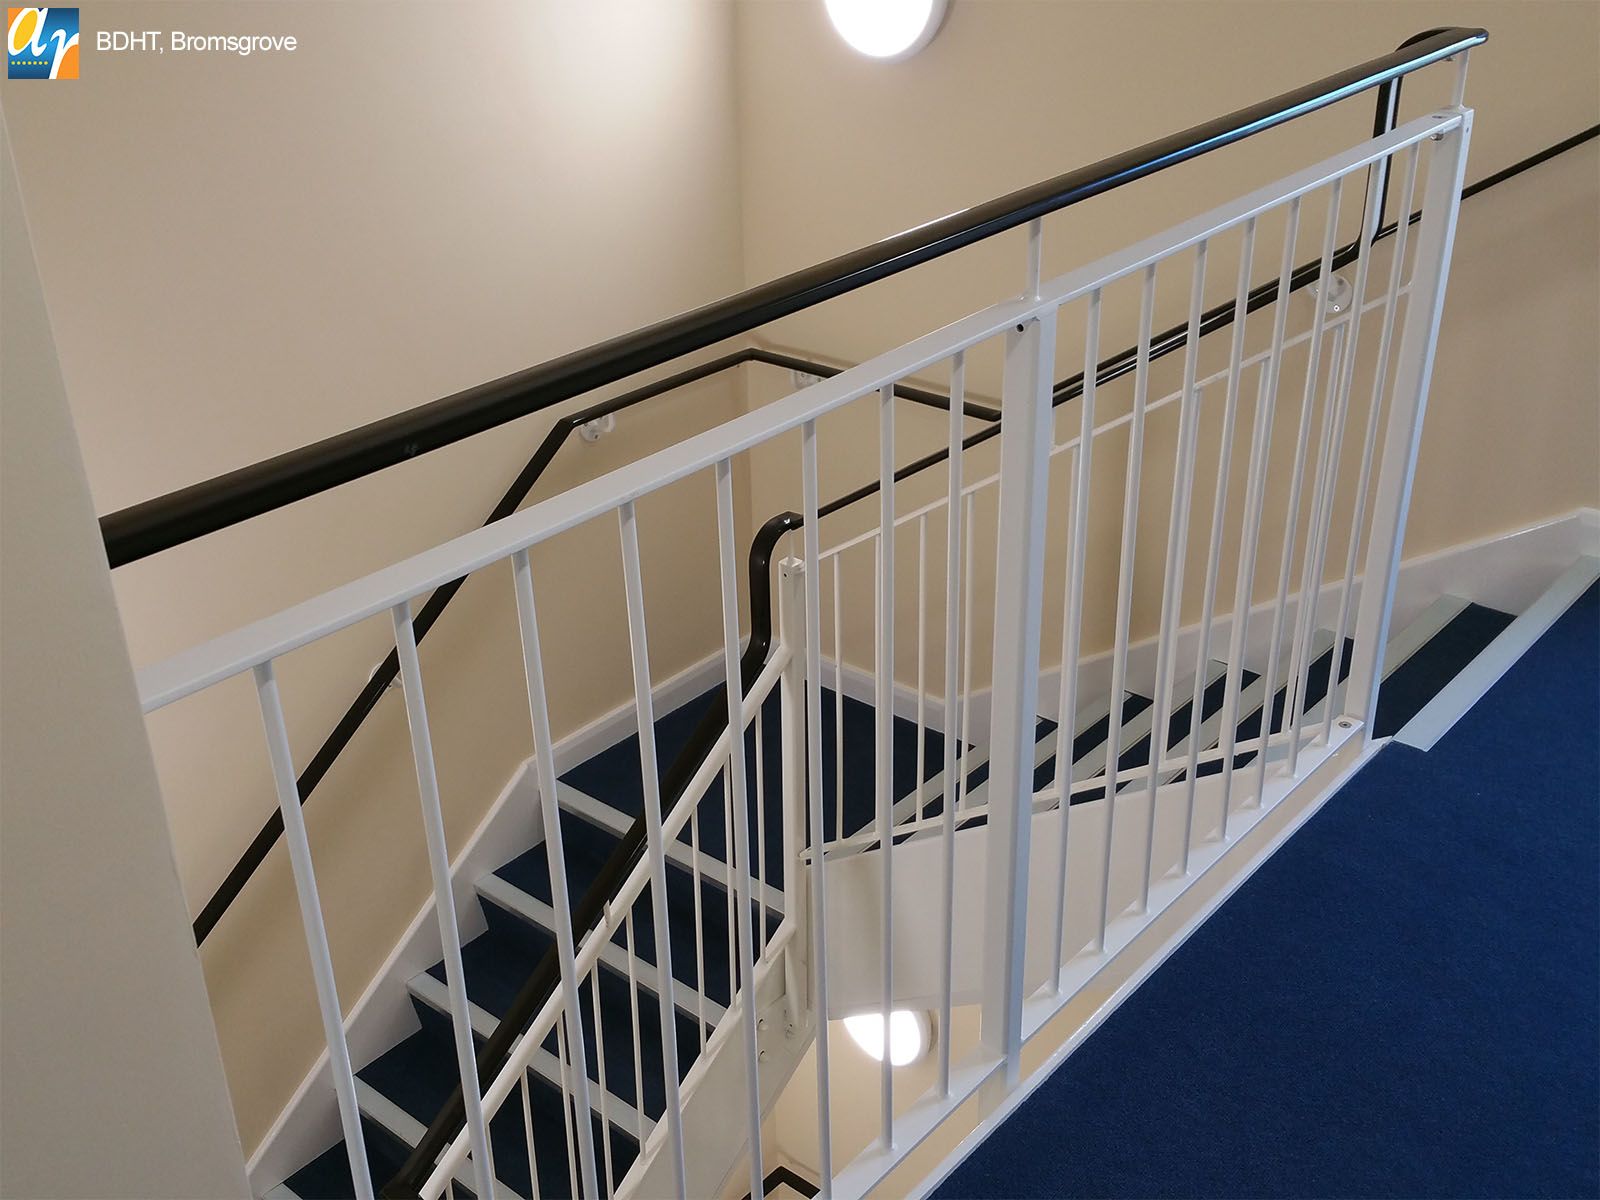 BDHT Bromsgrove metal stair railings